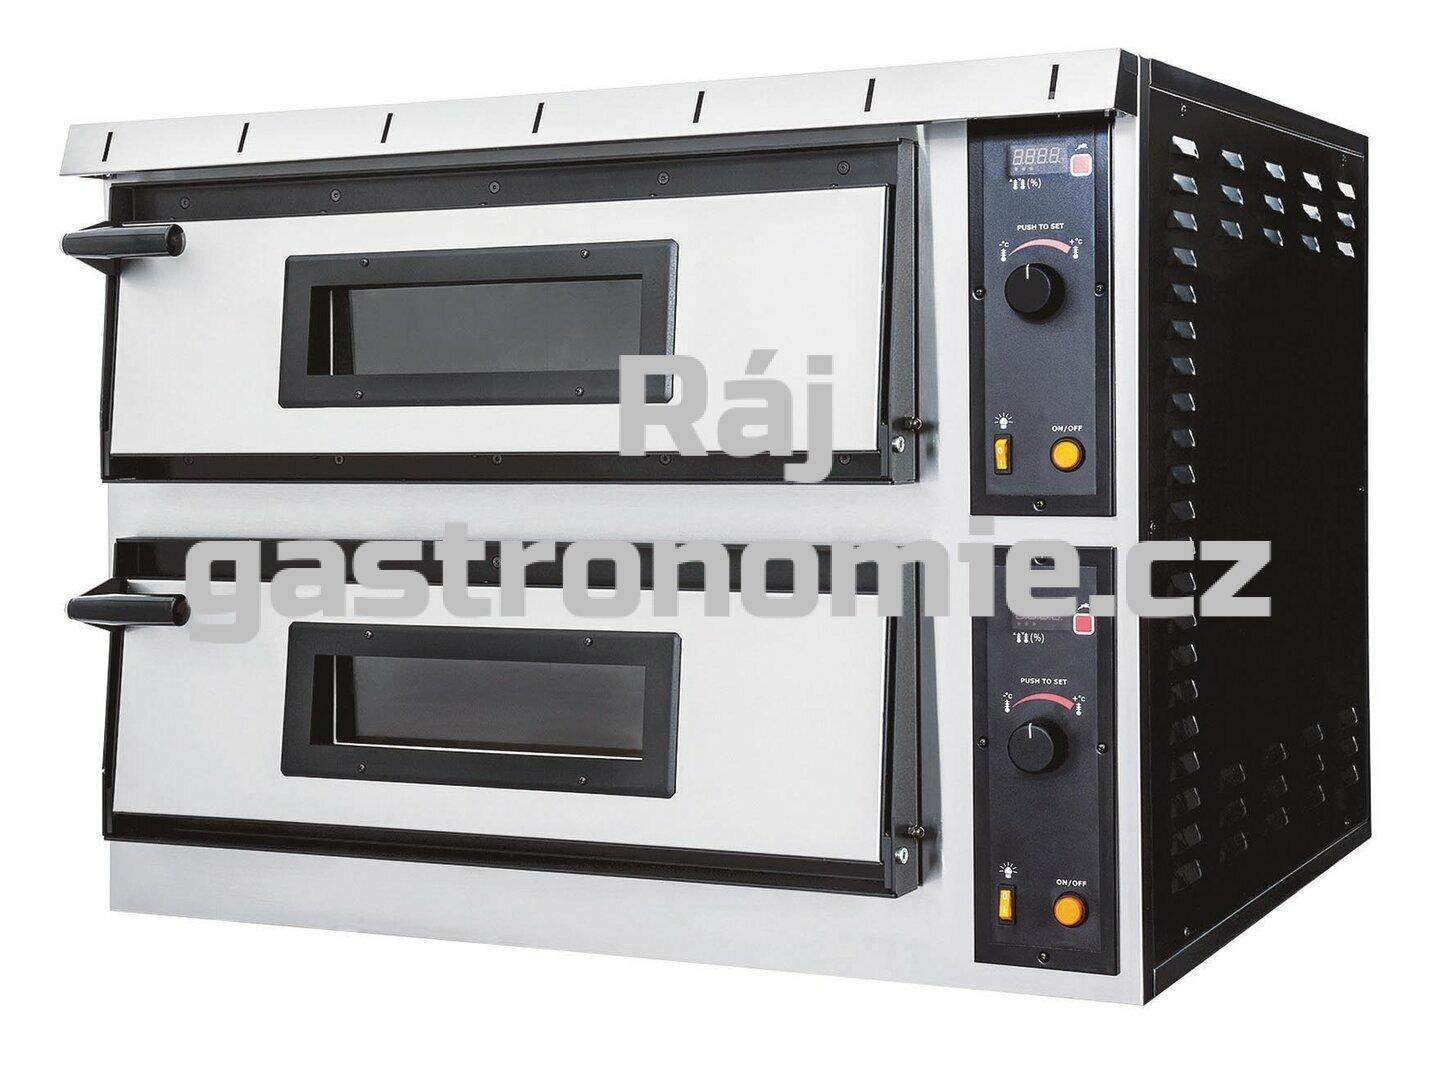 Pizza pec PLUS XL 44 DIGI/TR